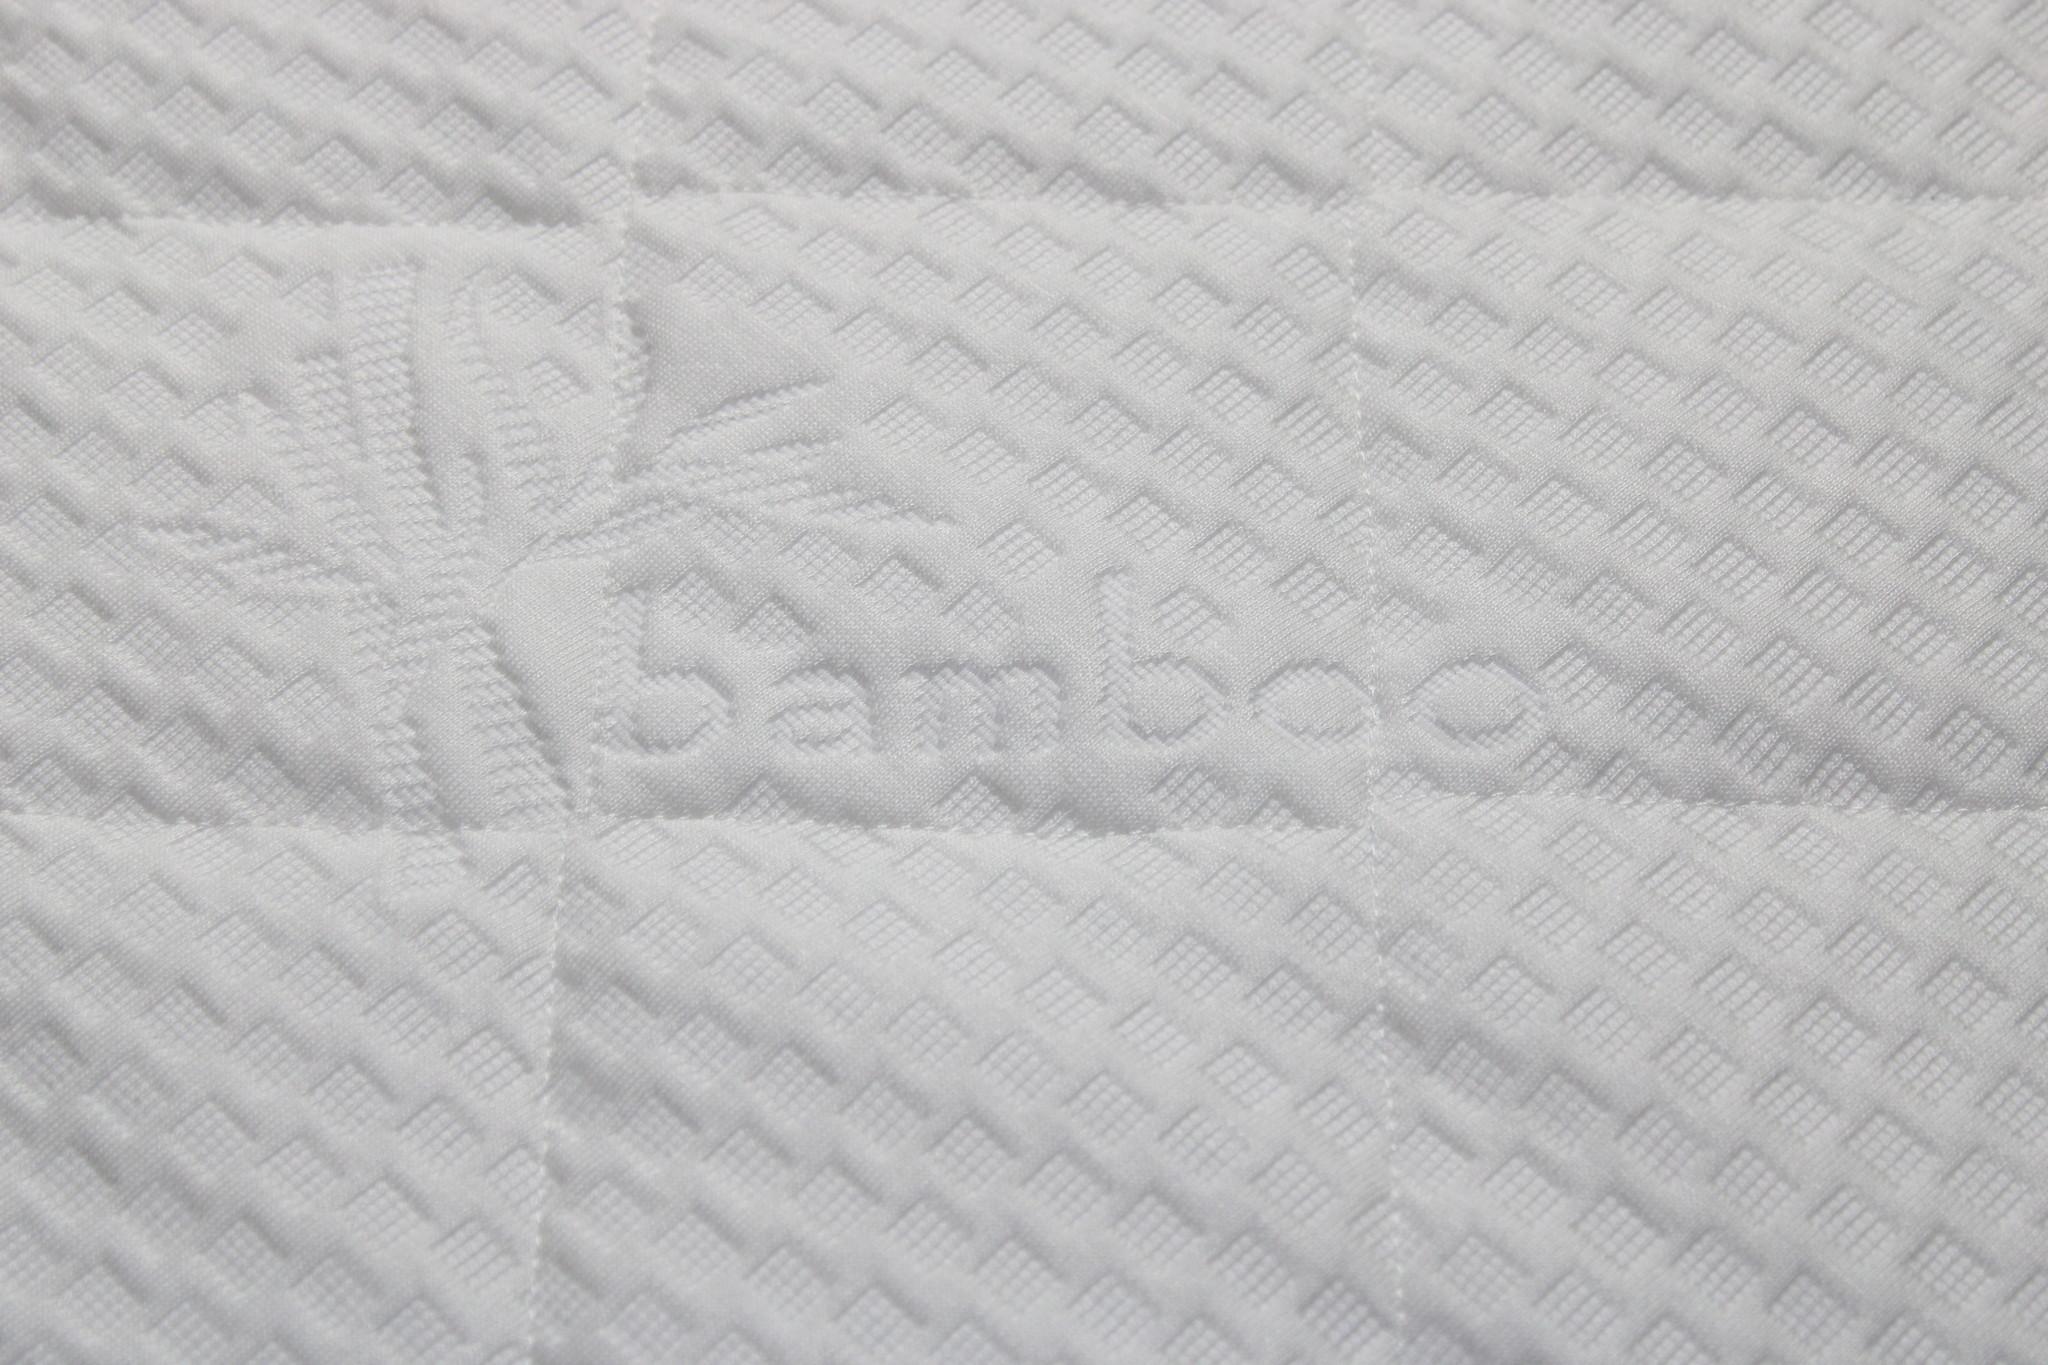 Sarpy Kindermatras 80x150 koudschuim hr40 bamboo